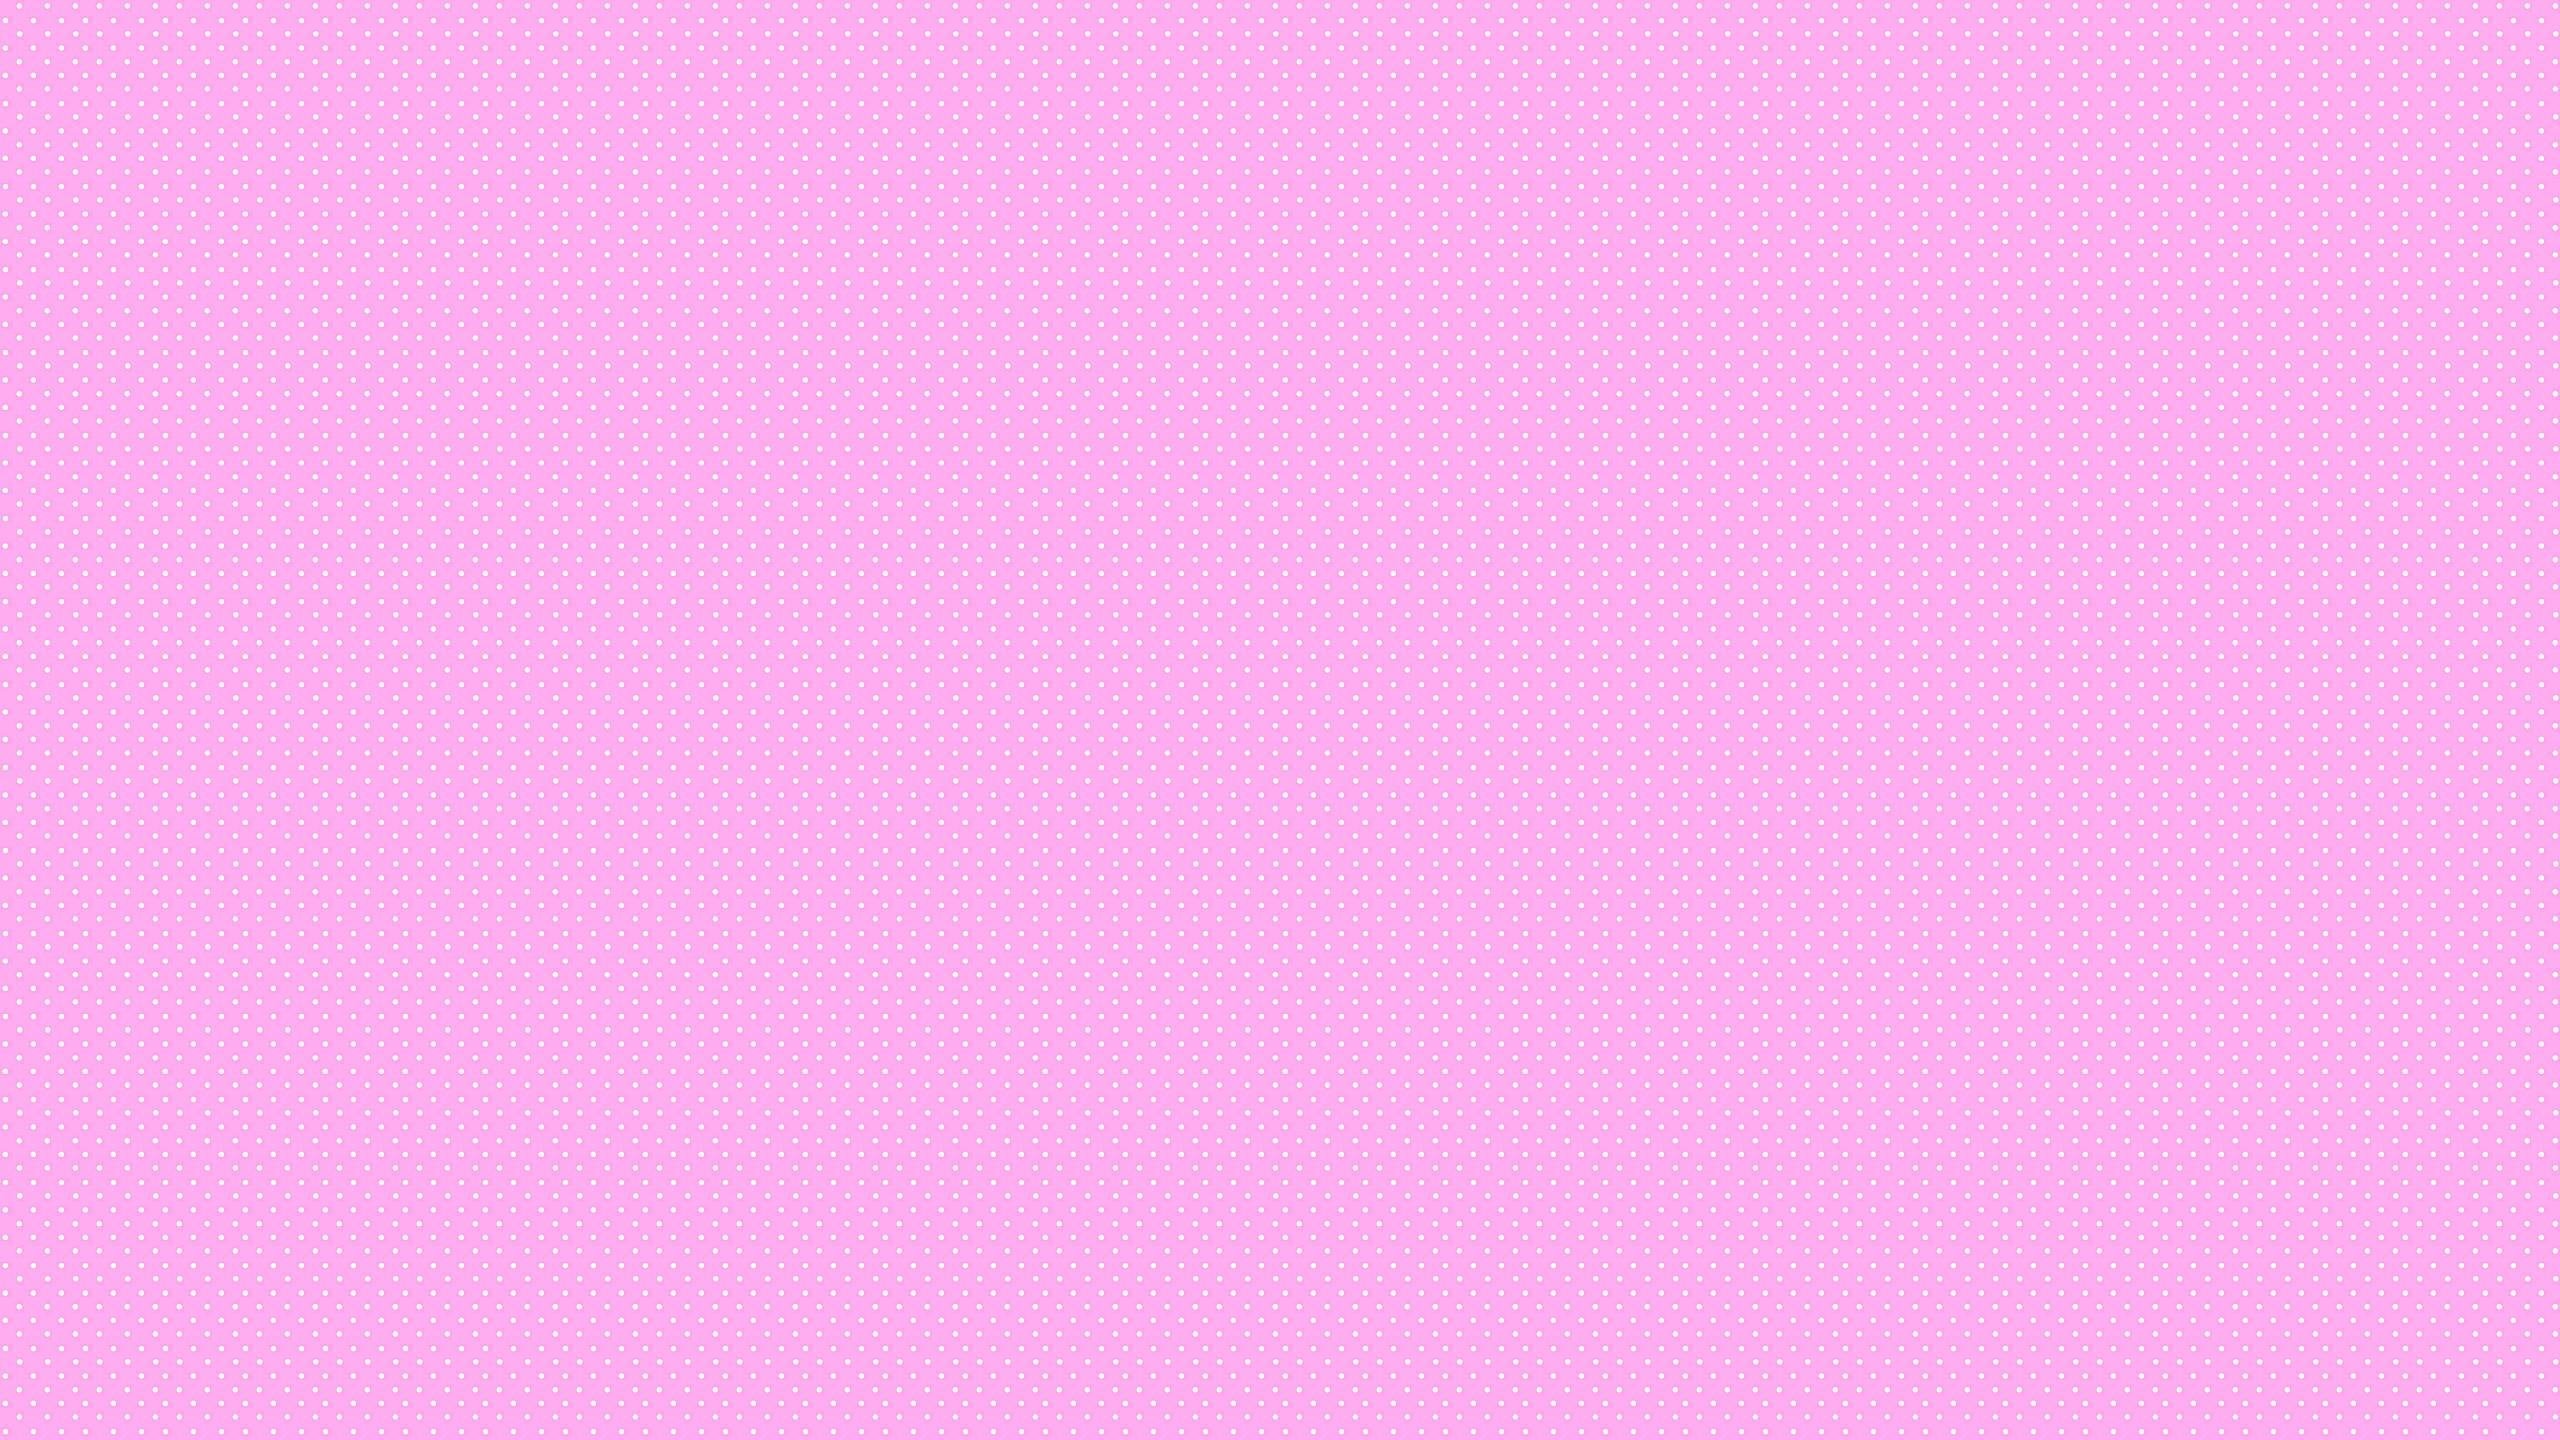 Free Download Pastel Pink Tumblr Background 99 Images In Collection Page 1 2560x1440 For Your Desktop Mobile Tablet Explore 52 Desktop Wallpaper Twilight Saga Tumblr Desktop Wallpaper Twilight Saga Tumblr Twilight